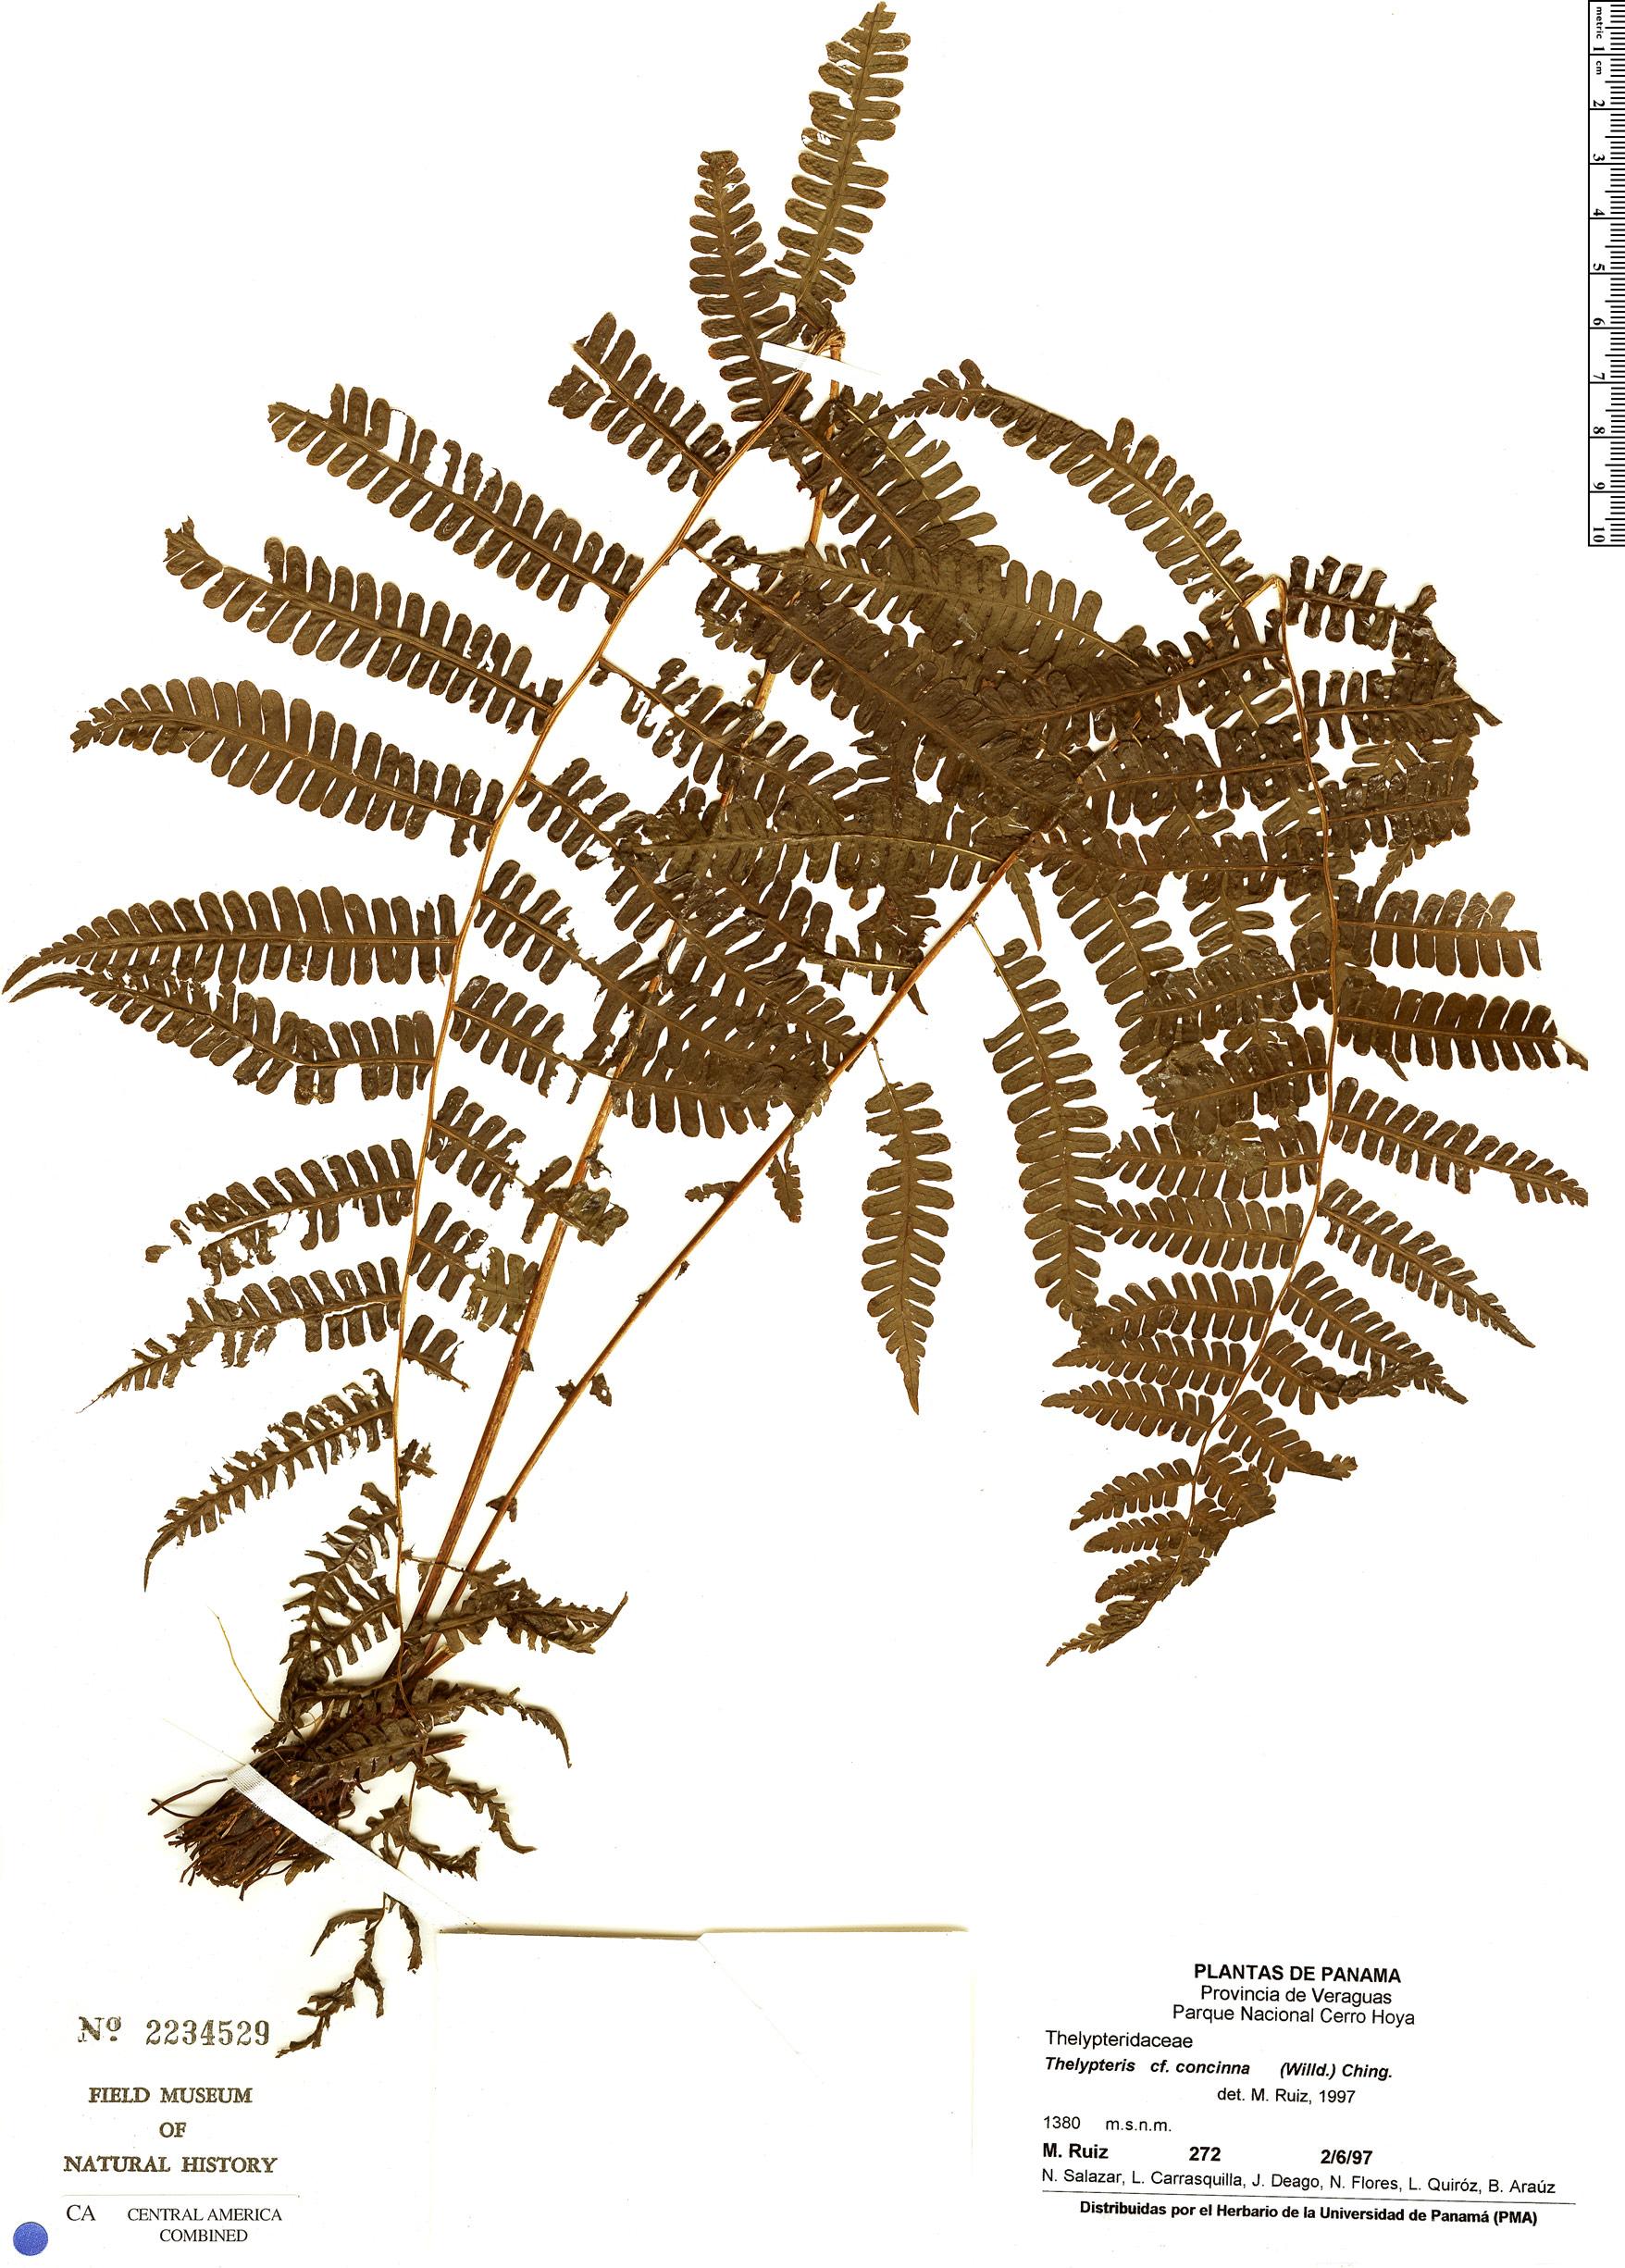 Specimen: Thelypteris concinna